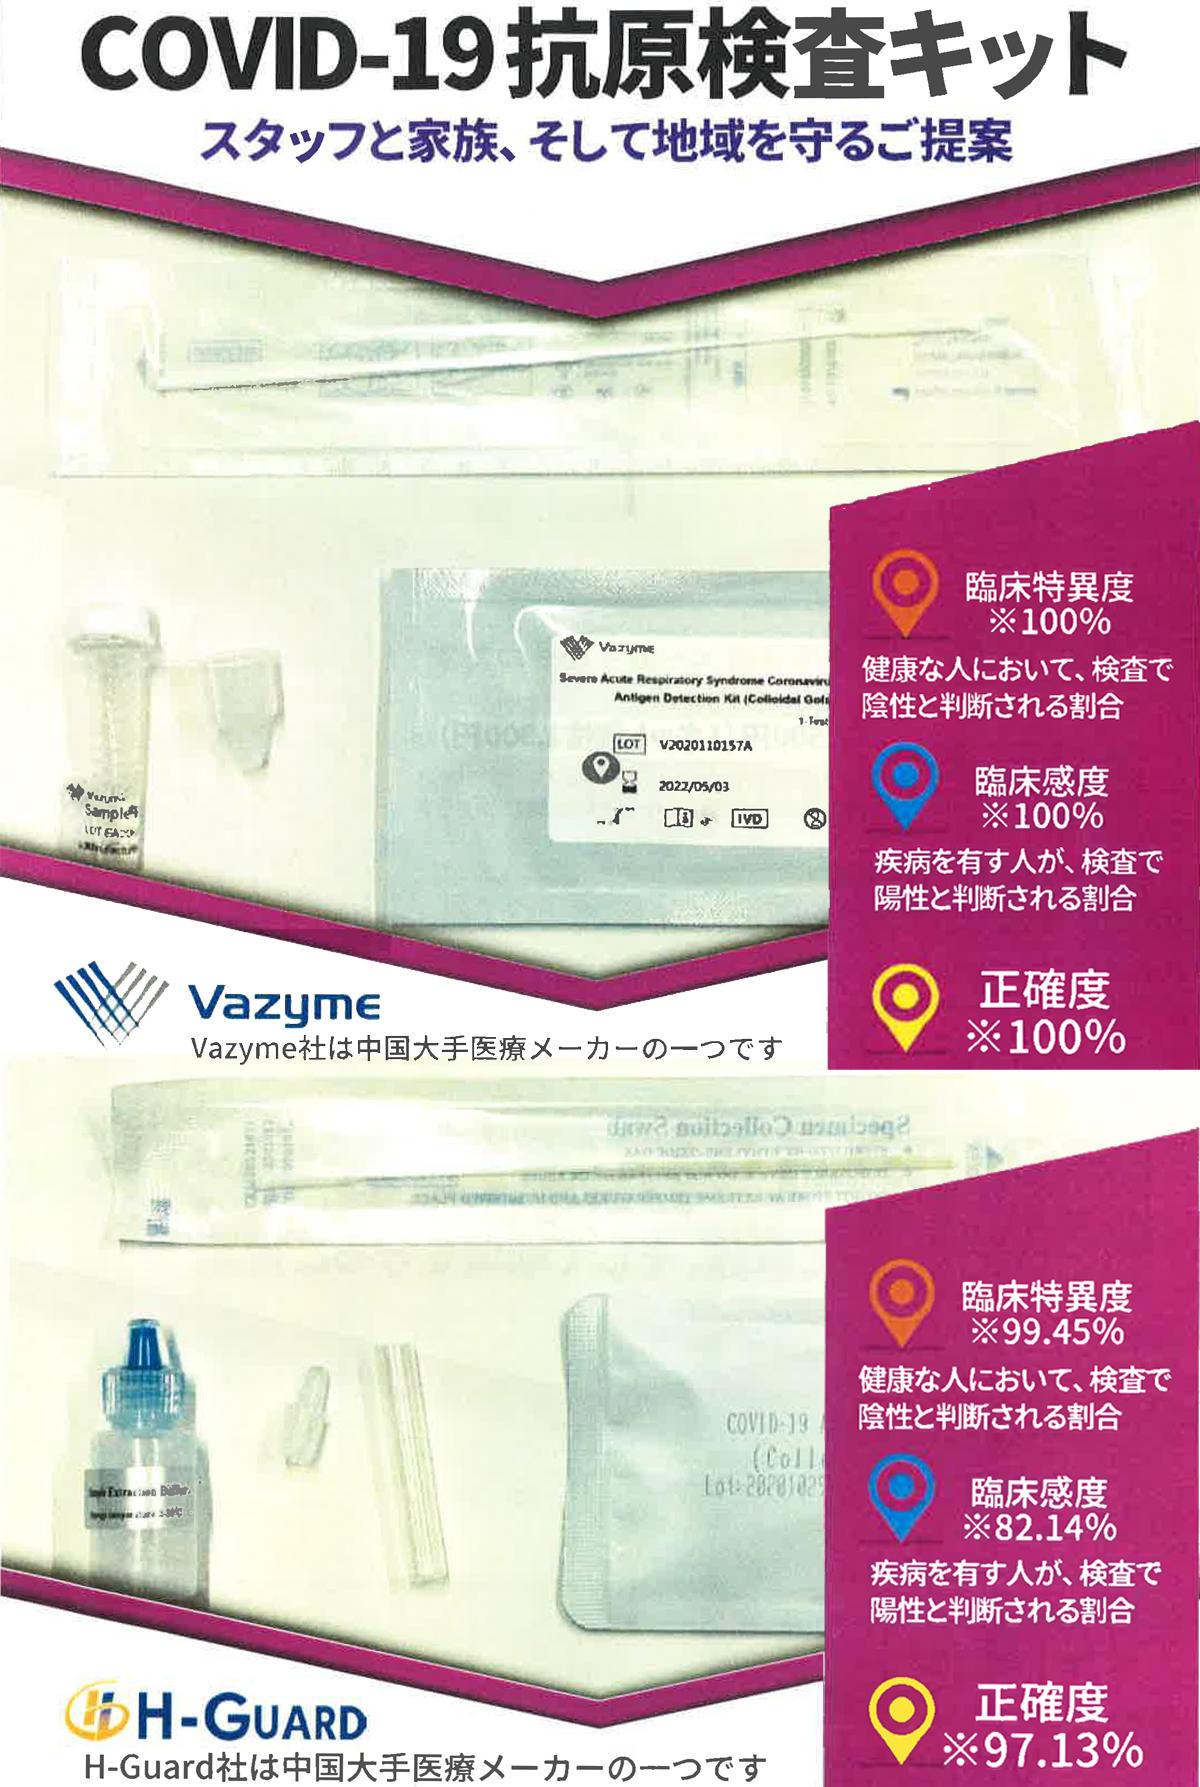 [PR] 十全美装株式会社 COVID-19抗原検査キットの取扱いを始めました。